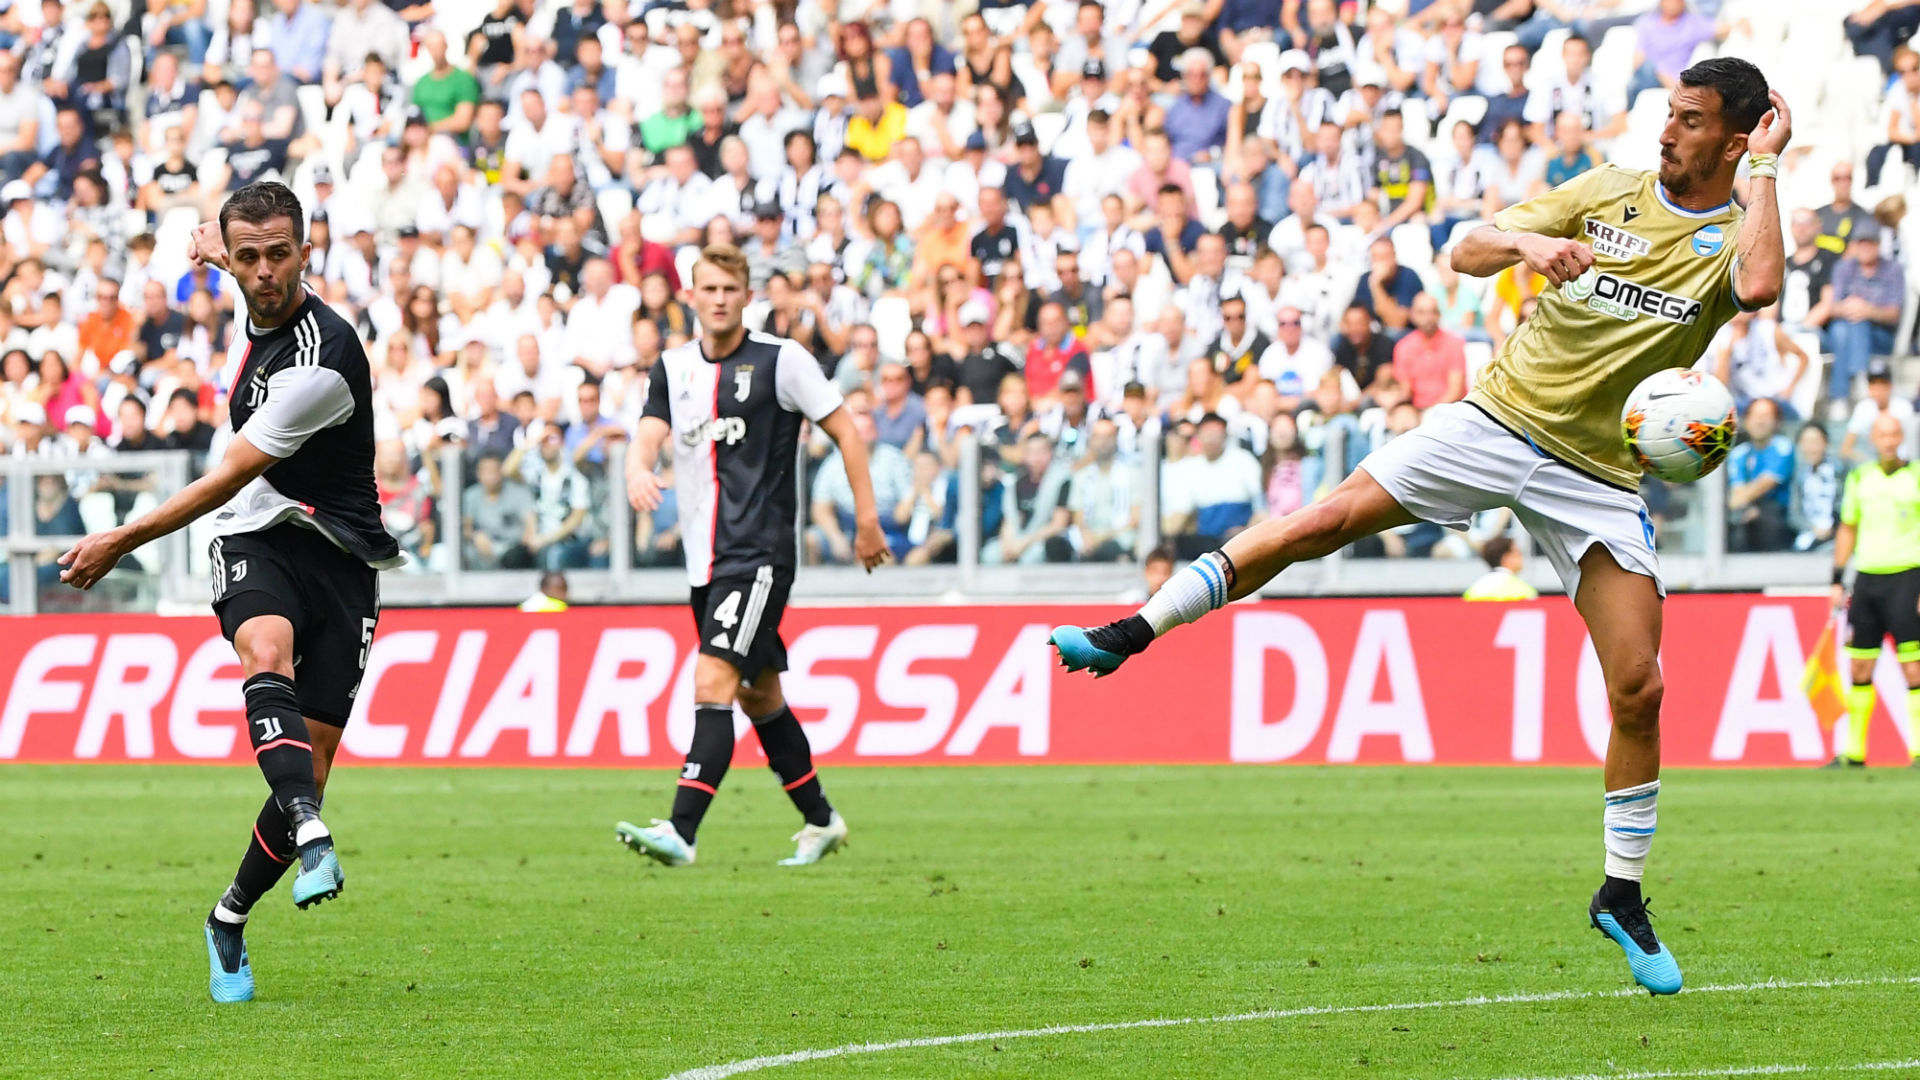 Juventus Spal Pjanic Serie A 2019/2020